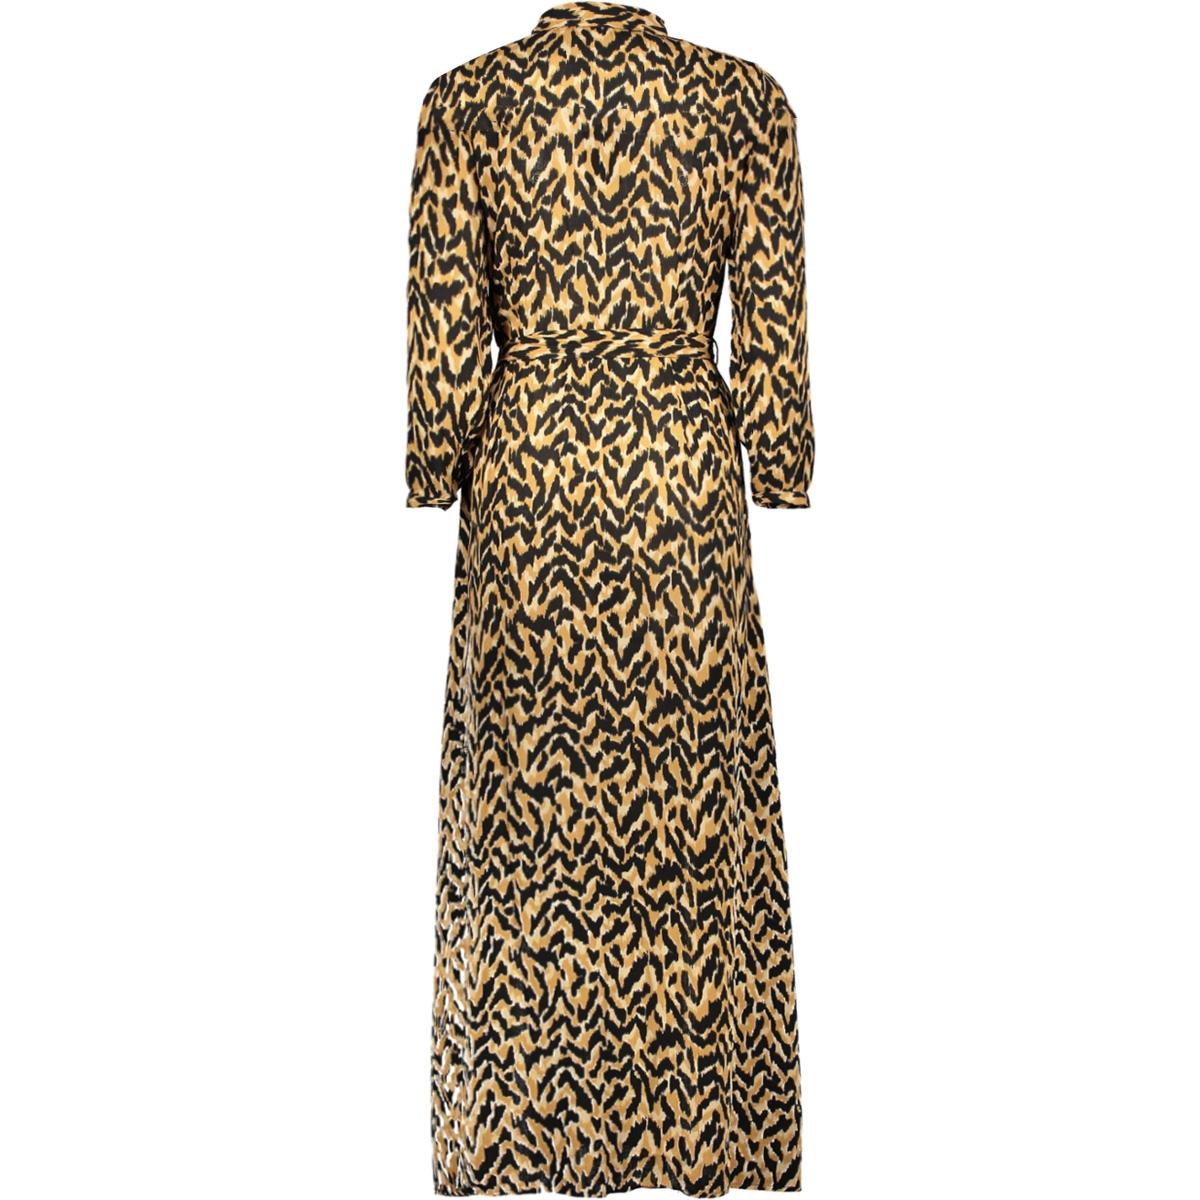 vmathen 7/8 ankle shirt dress vip 10232448 vero moda jurk nomad/anna